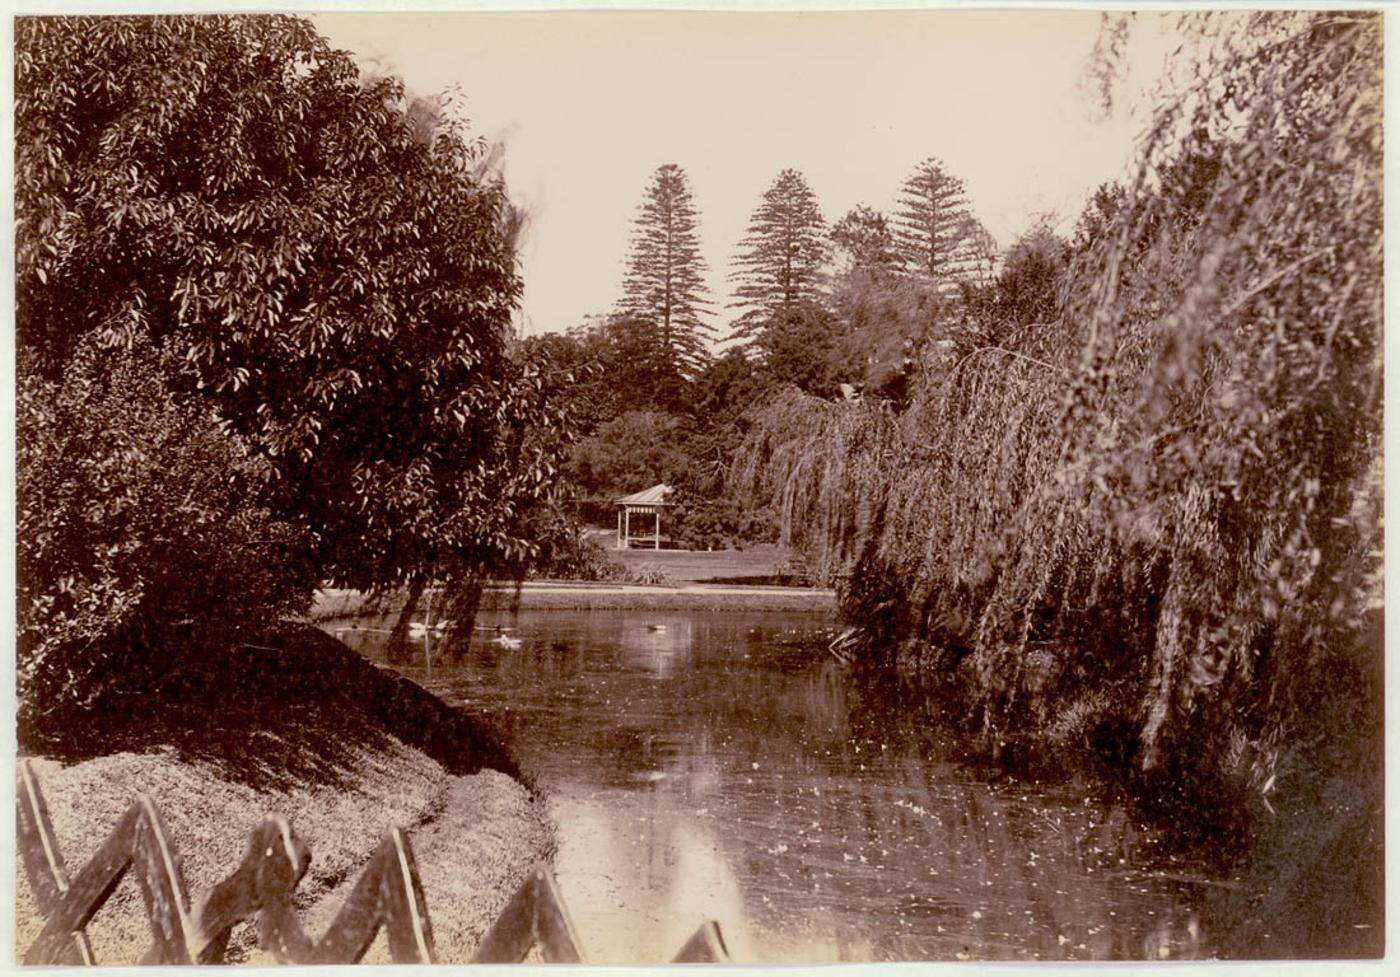 Botanical Gardens, Sydney [showing pond], c. 1900-1910